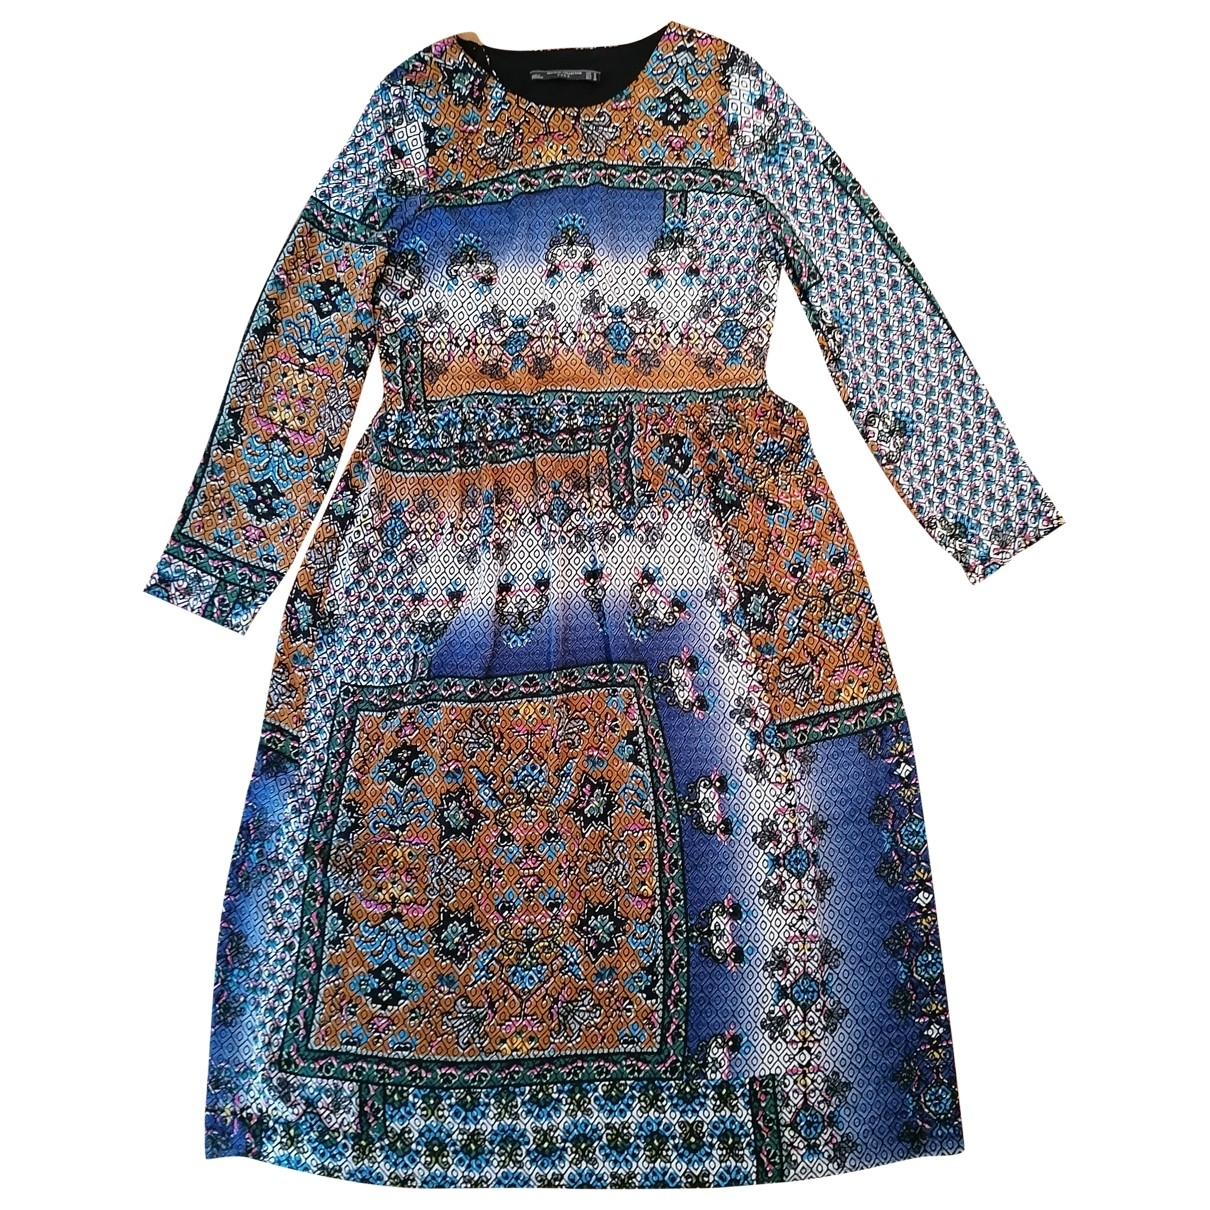 Zara \N dress for Women M International